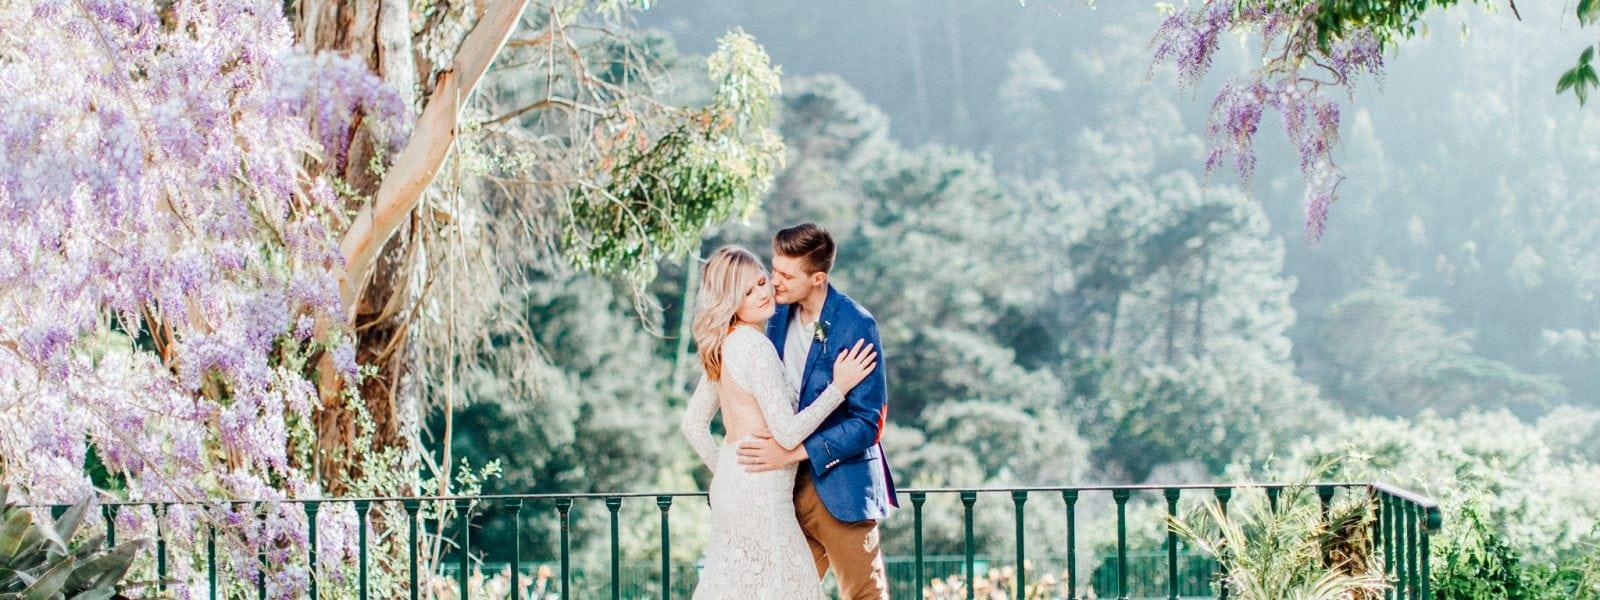 Heiraten In Portugal Dream Weddings International